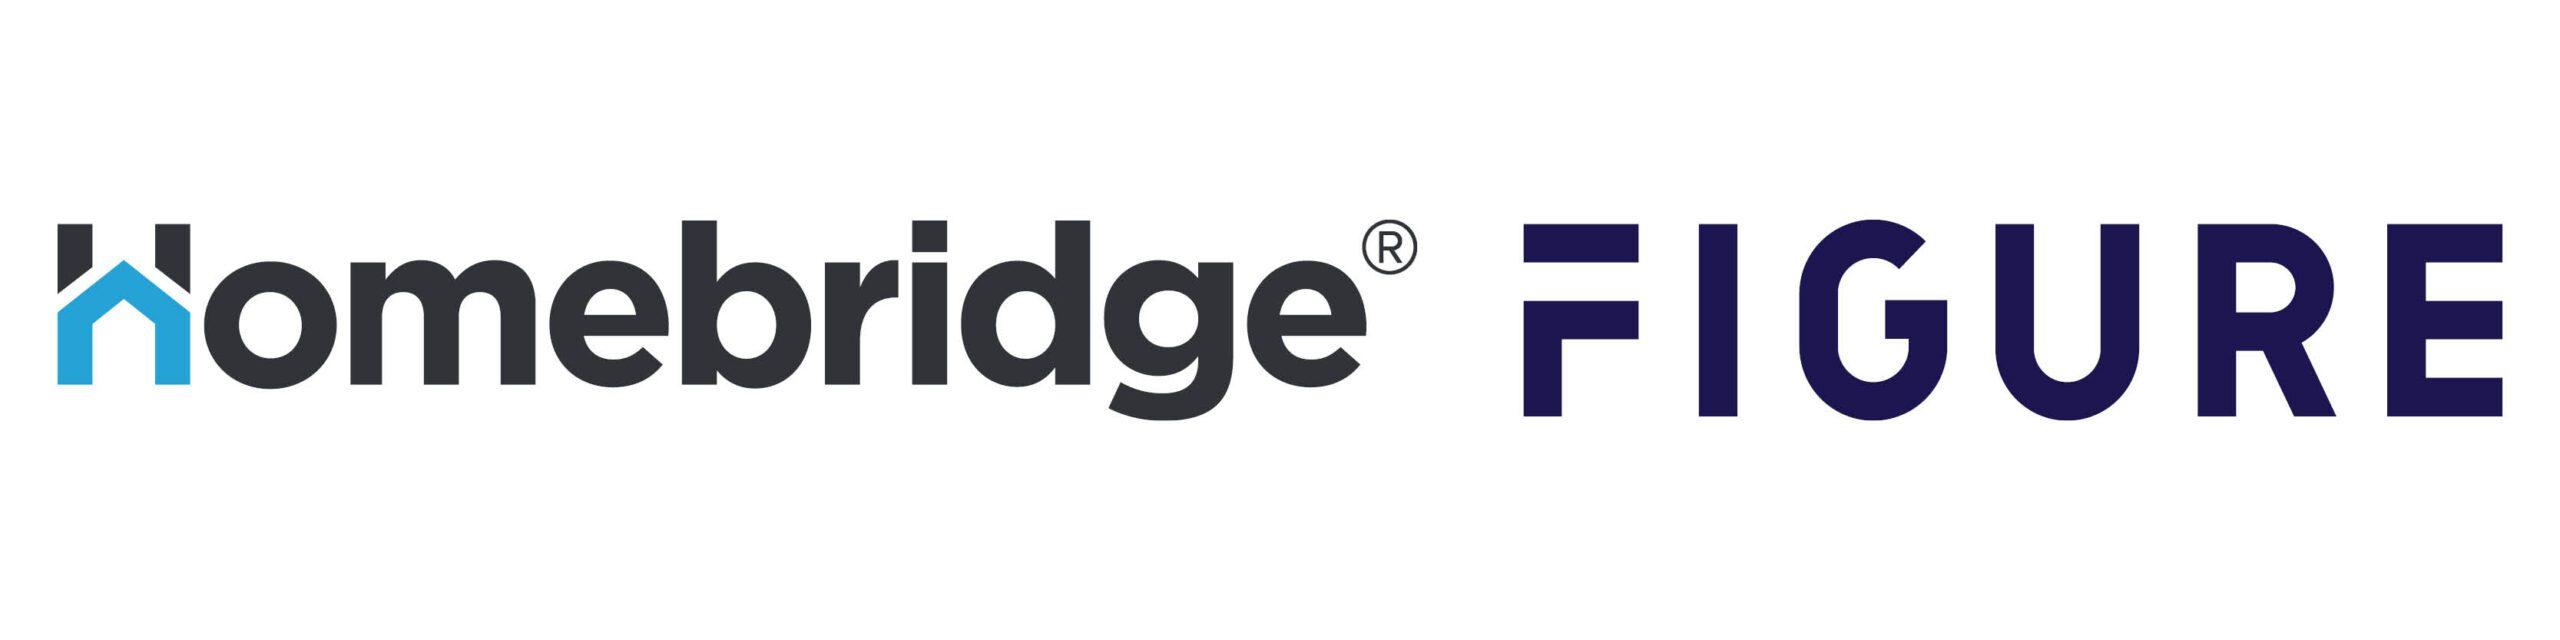 Homebridge and Figure Logos